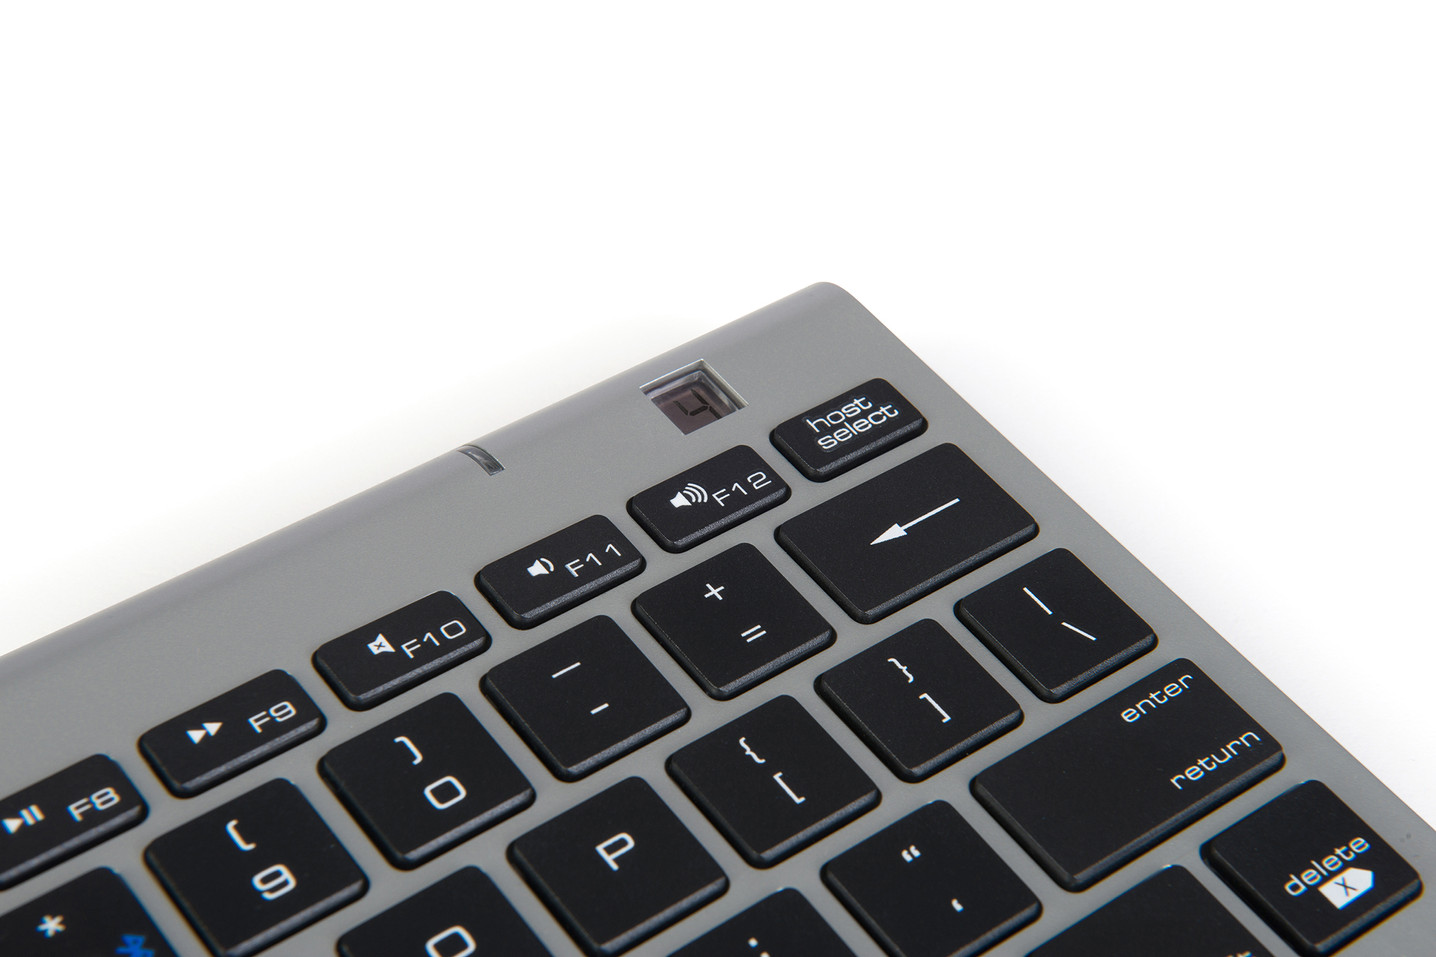 m-board-870-bluetooth-keyboard-compact-k